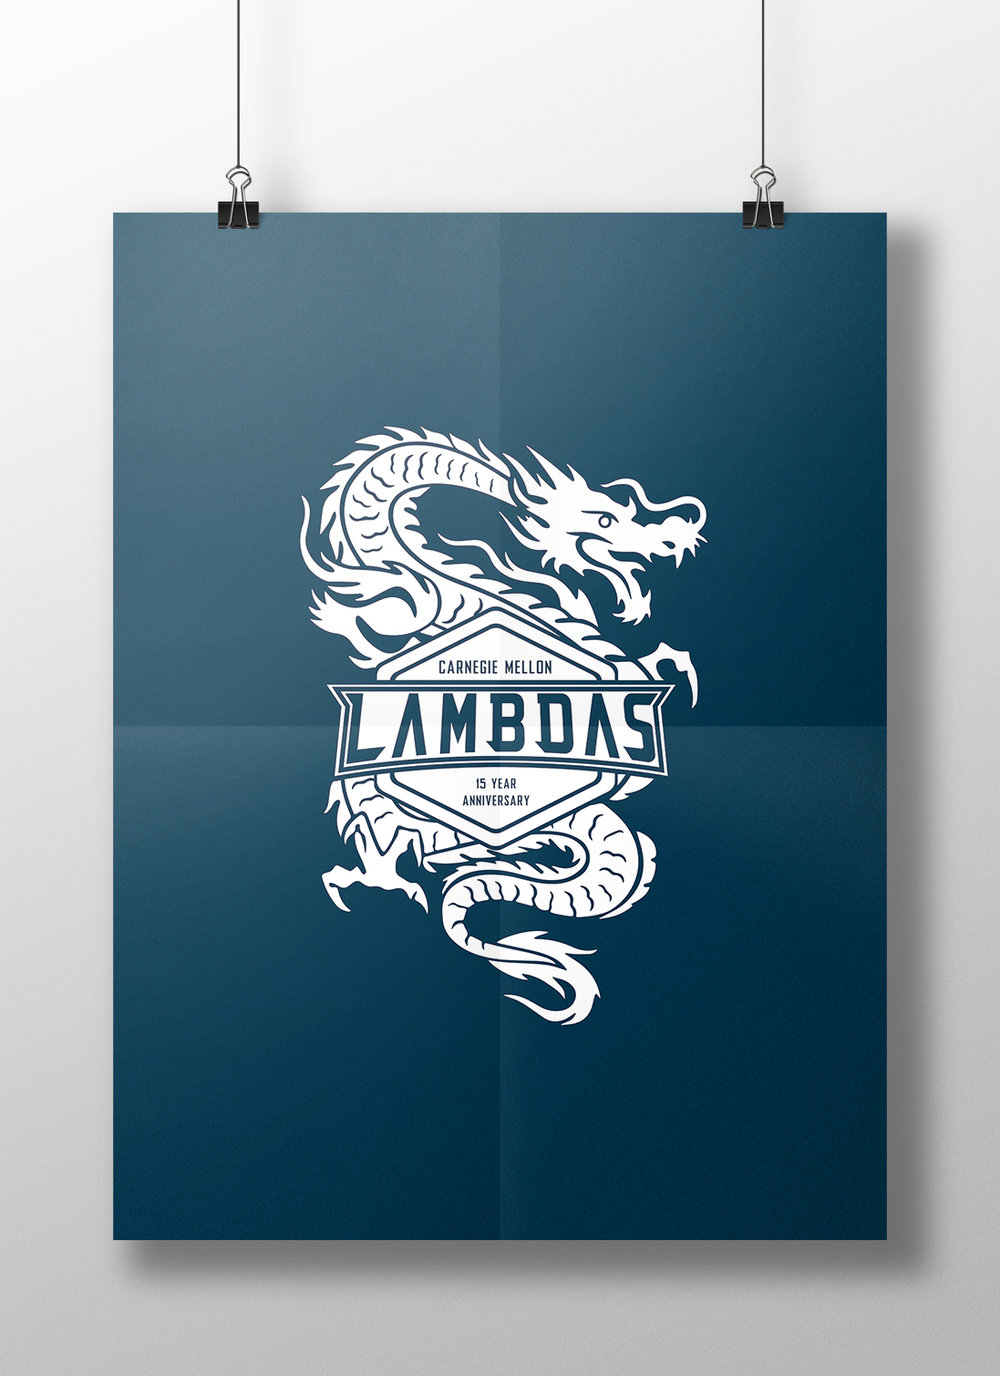 lambda_poster_mockup.jpg